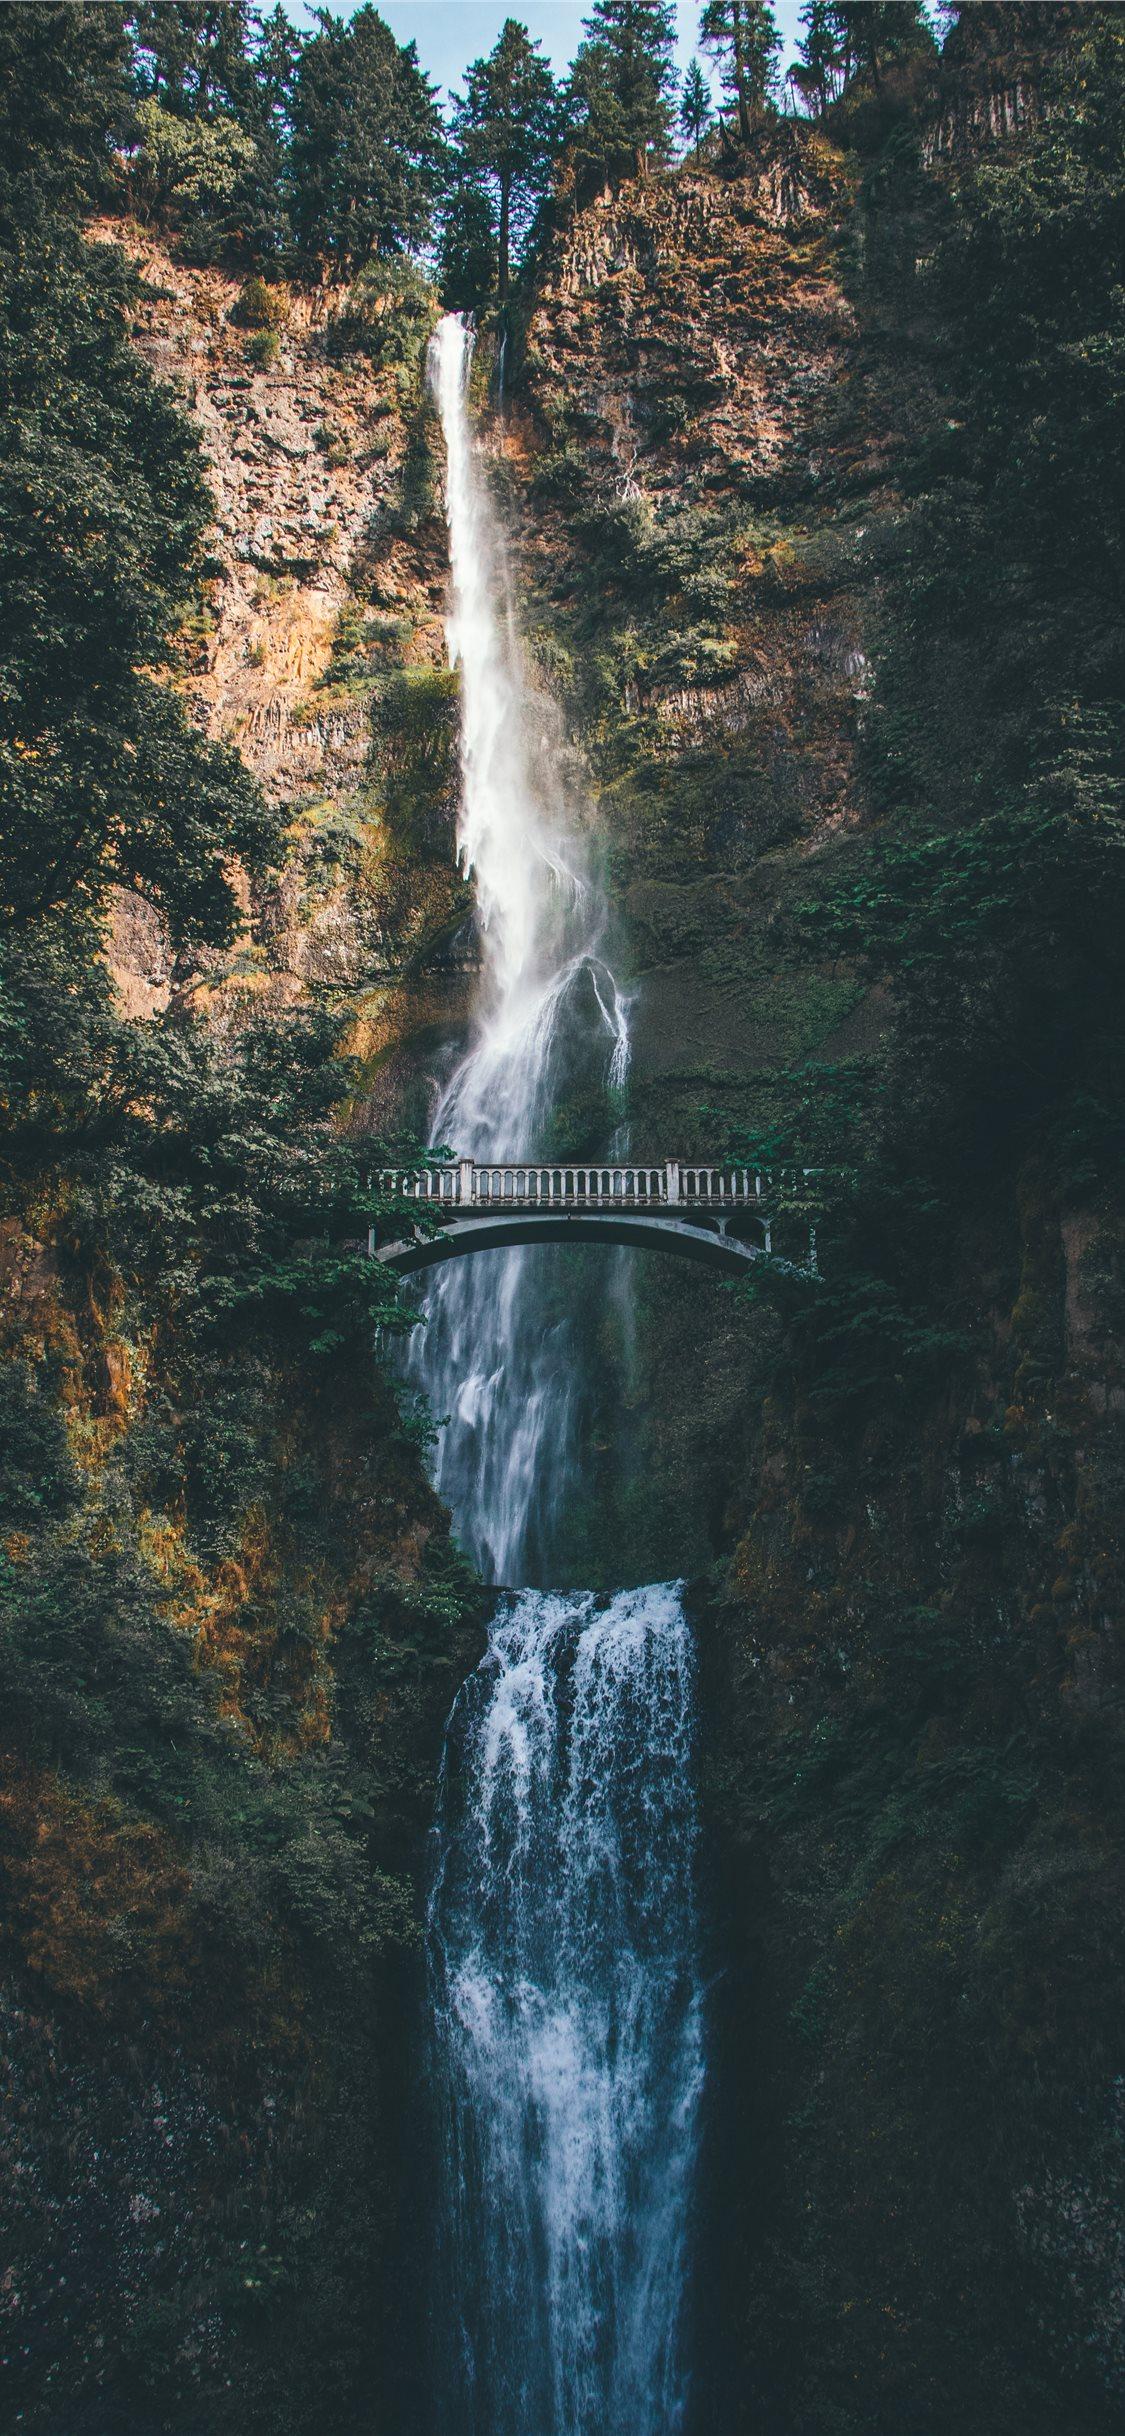 Best Waterfall Iphone X Hd Wallpapers Ilikewallpaper